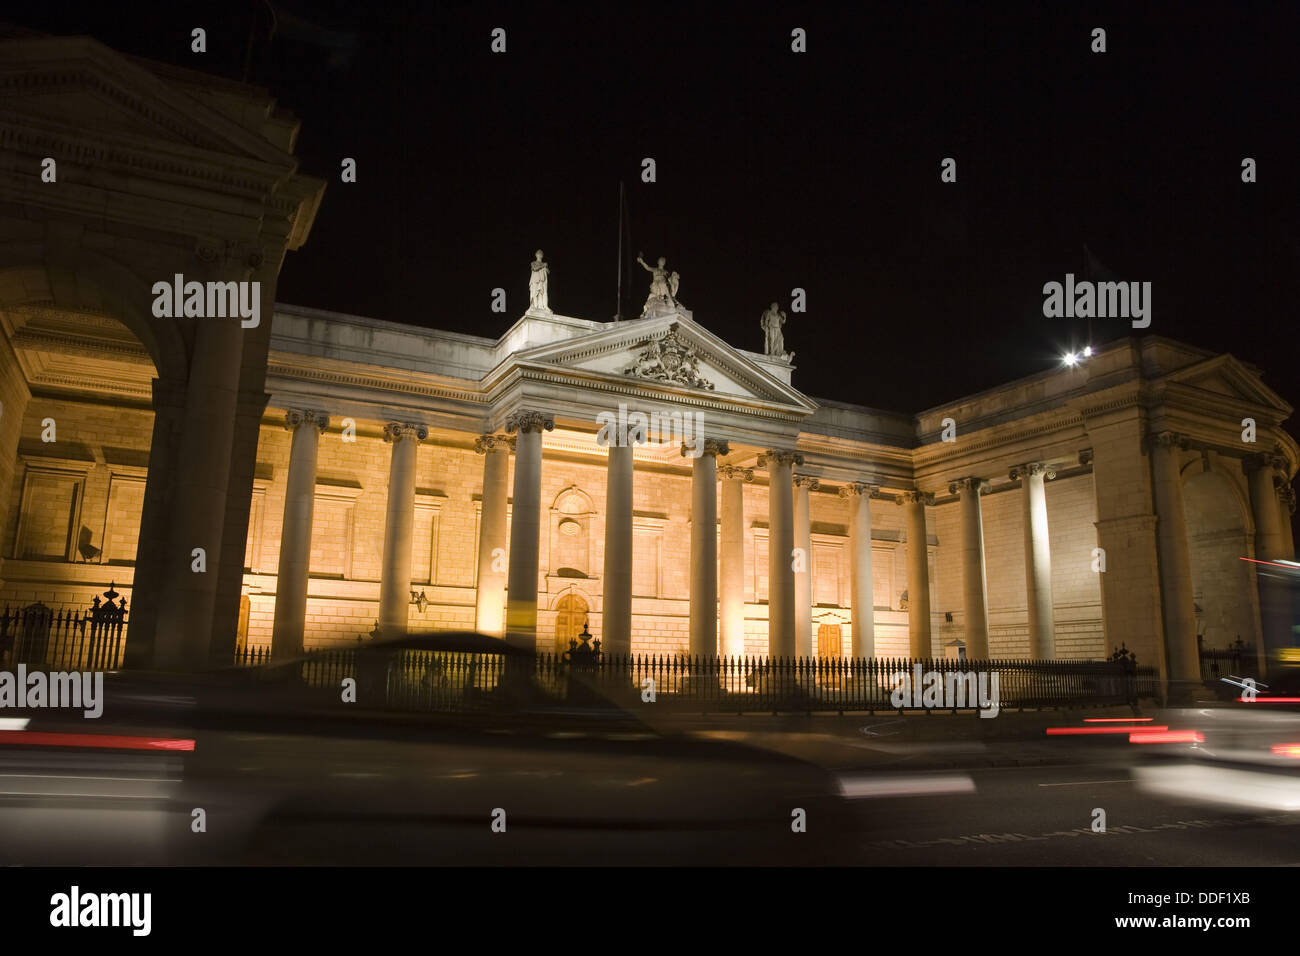 Bank of Ireland in Parliament Square. Dublin, Ireland - Stock Image